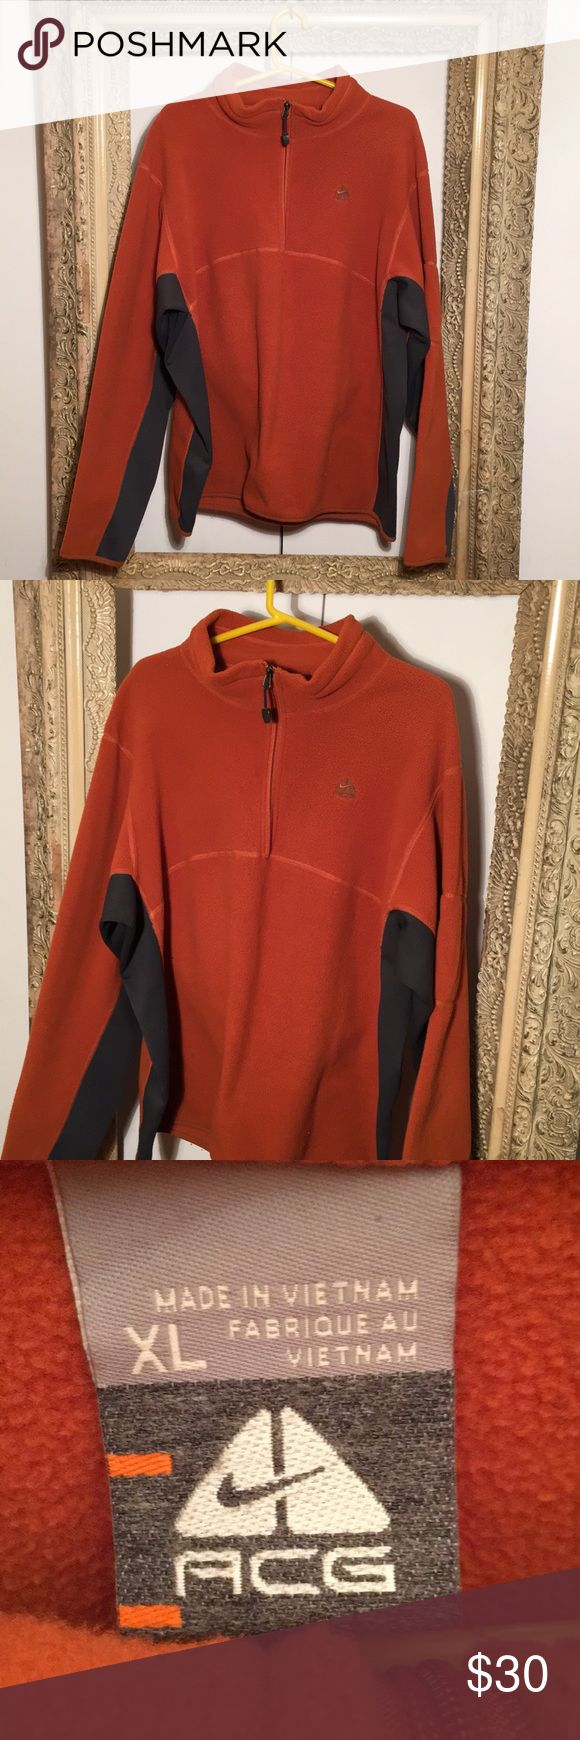 Nike ACG Half Zip Polar Fleece Sweater x Jacket Size XL - excellent condition Nike Jackets & Coats